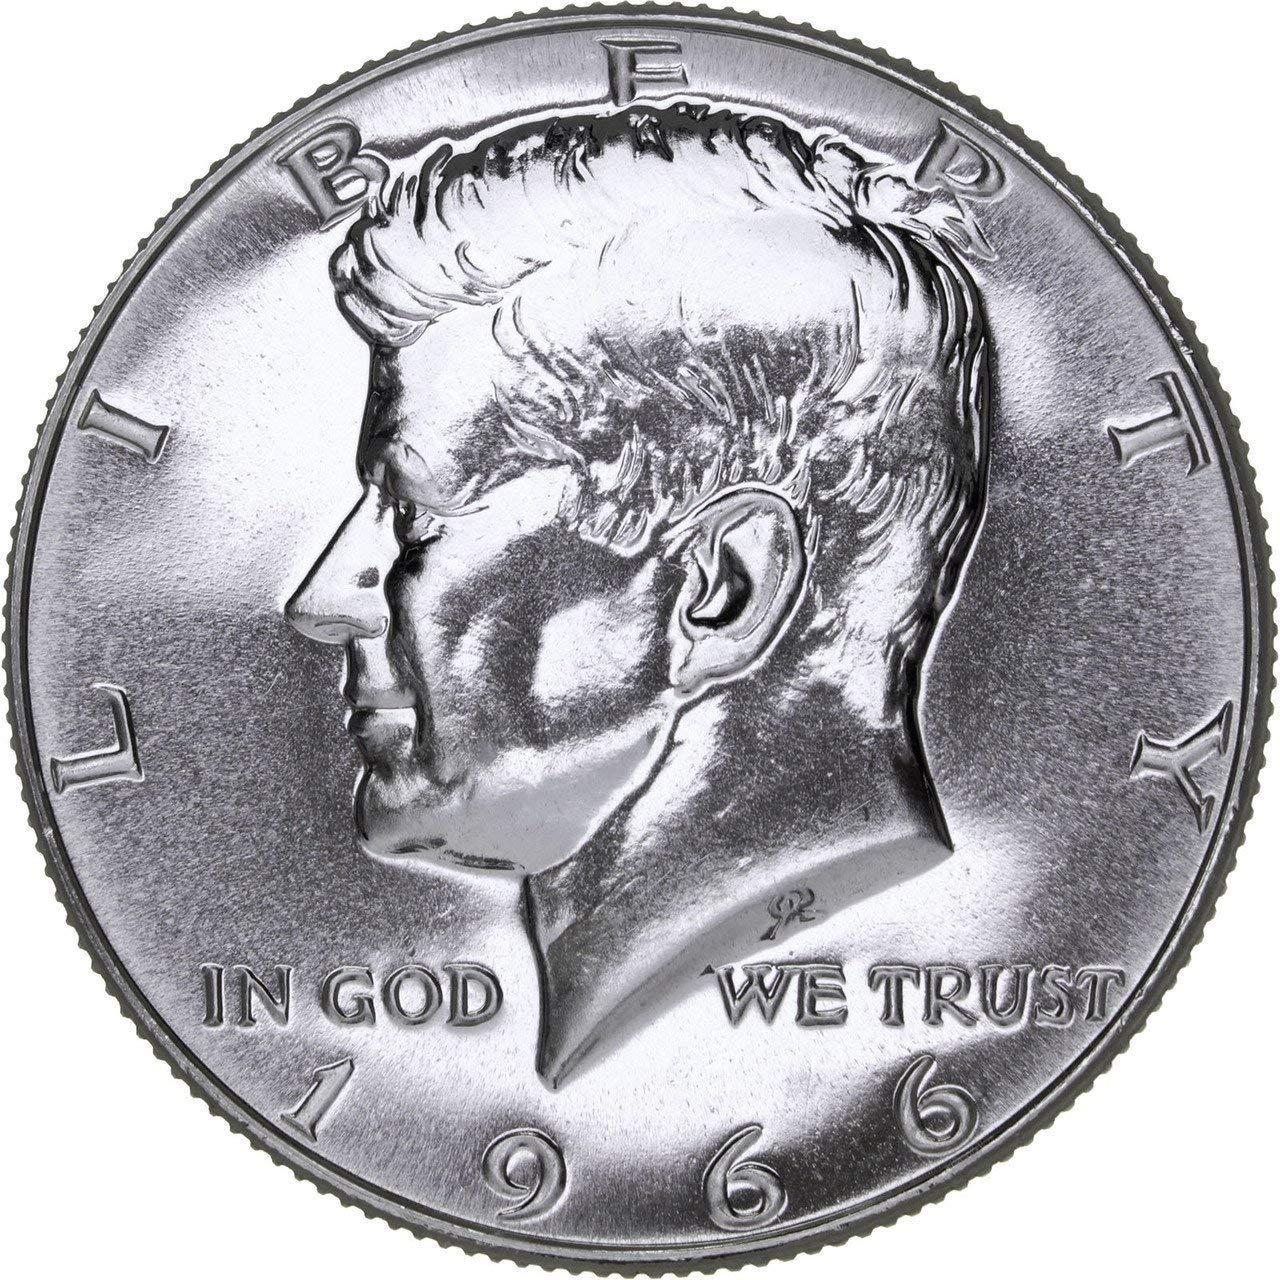 1966 United States Special Mint Set Silver Kennedy GEM BRILLIANT SETS